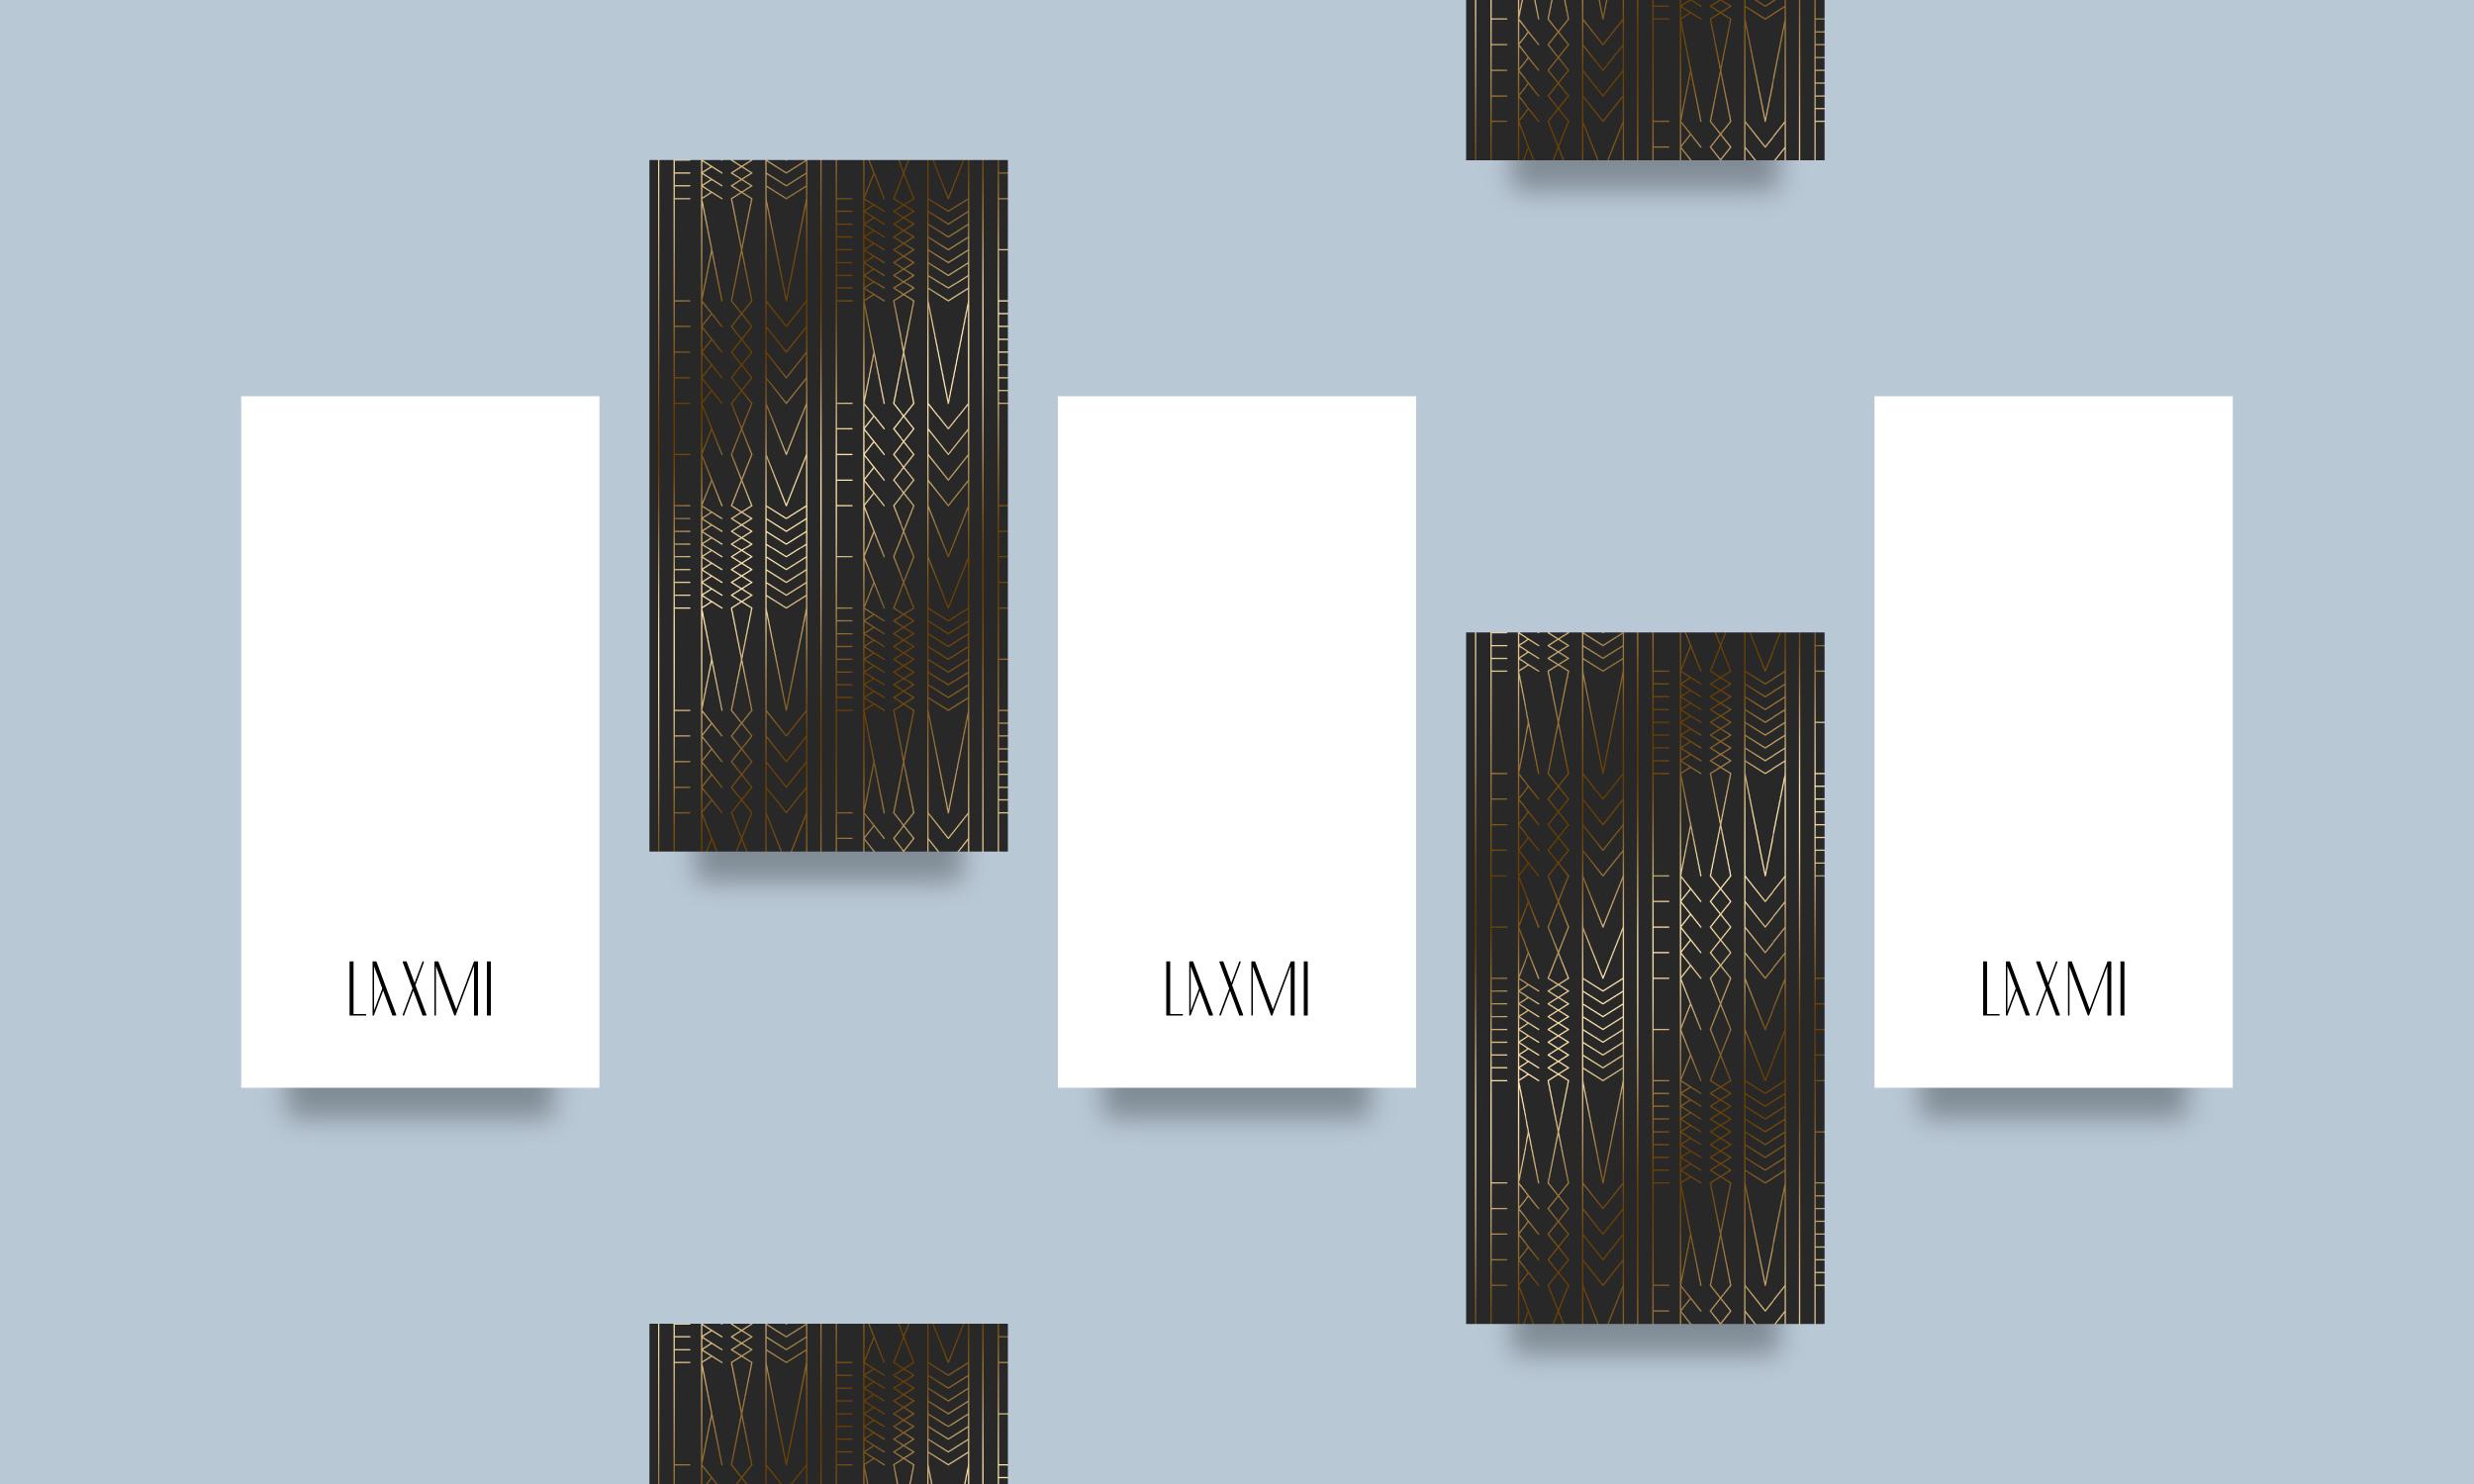 laxmi_cards.jpg